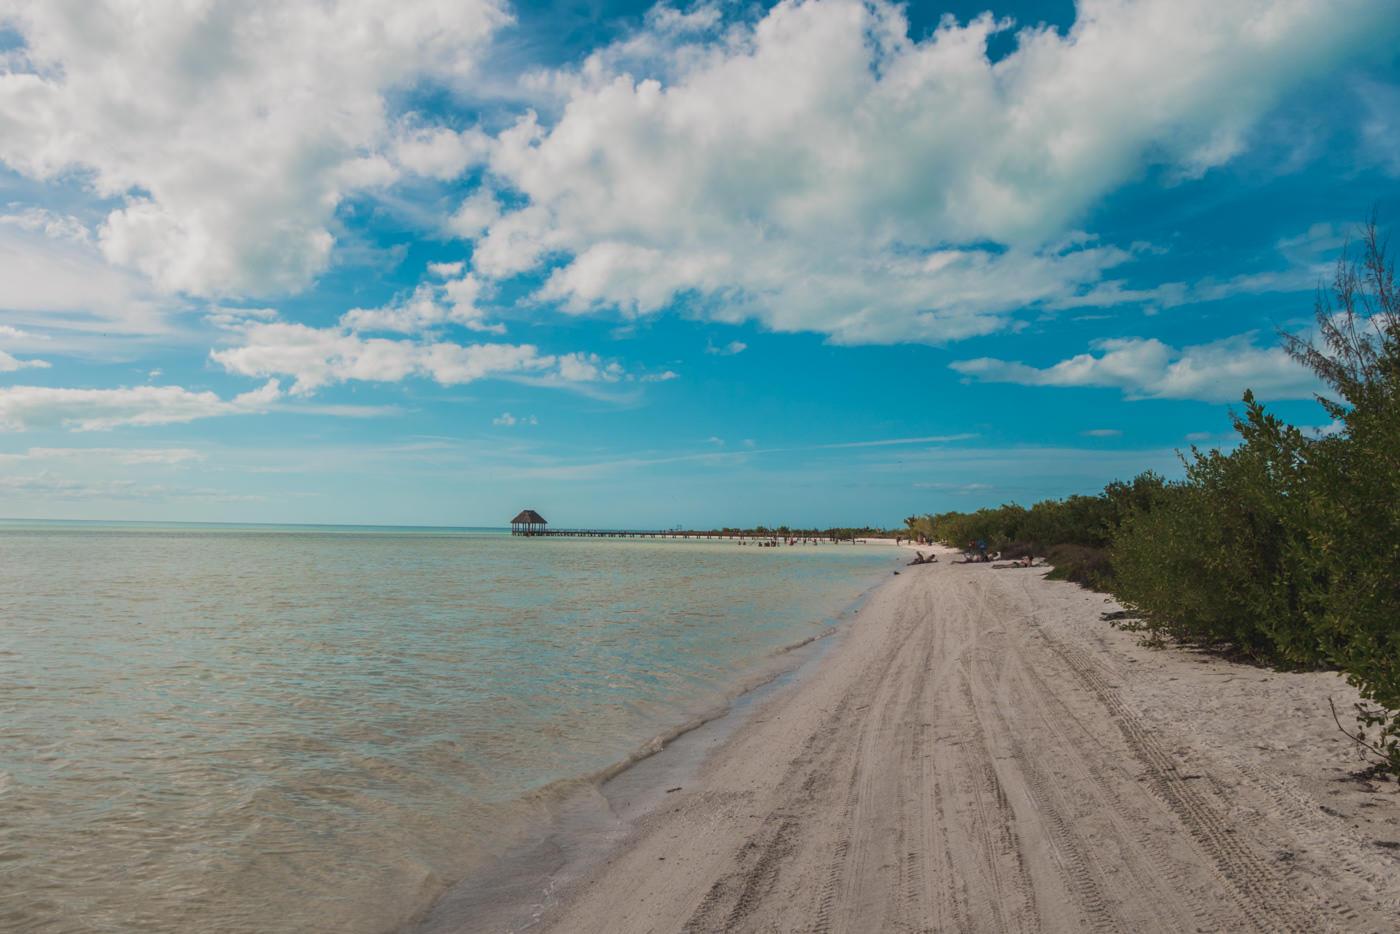 Punte Coco auf Isla Holbox in Mexiko